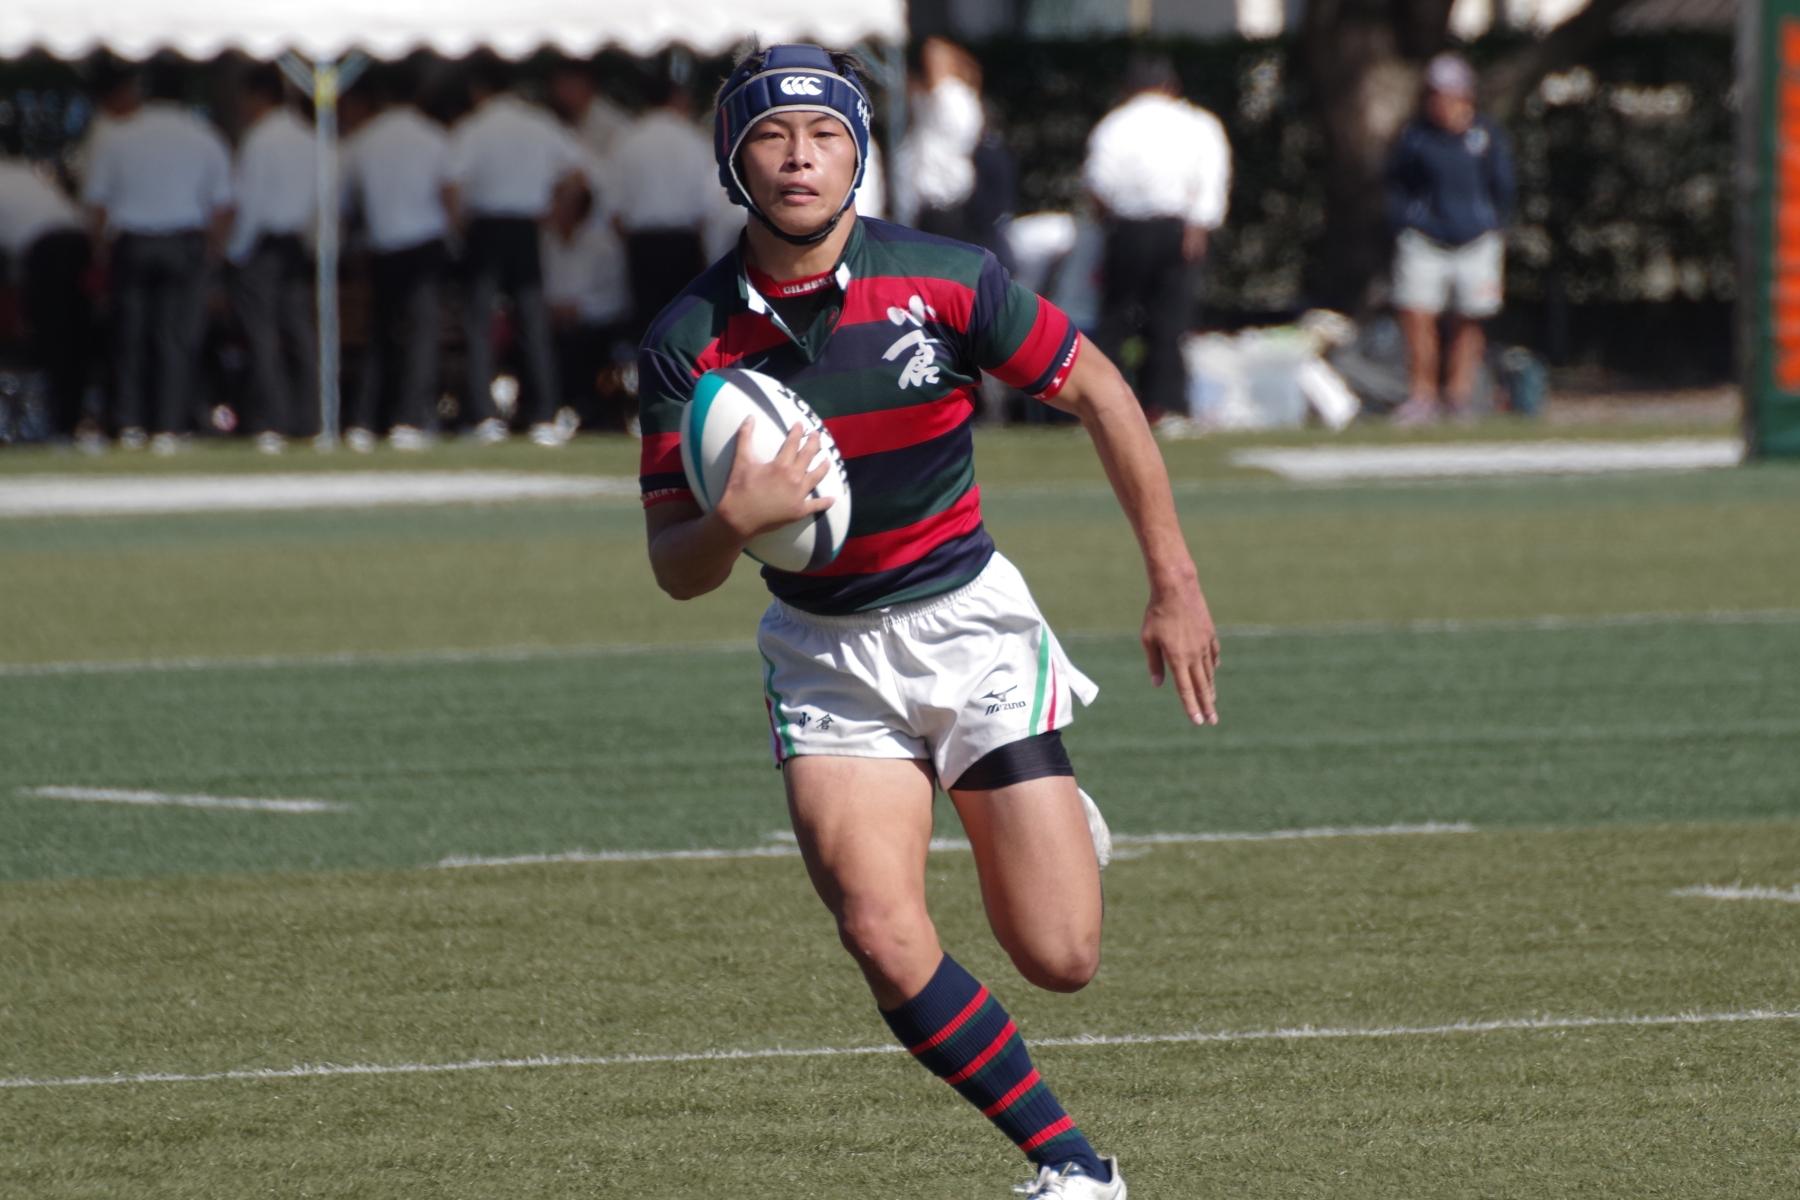 http://kokura-rugby.sakura.ne.jp/181021_132152_1073.jpg